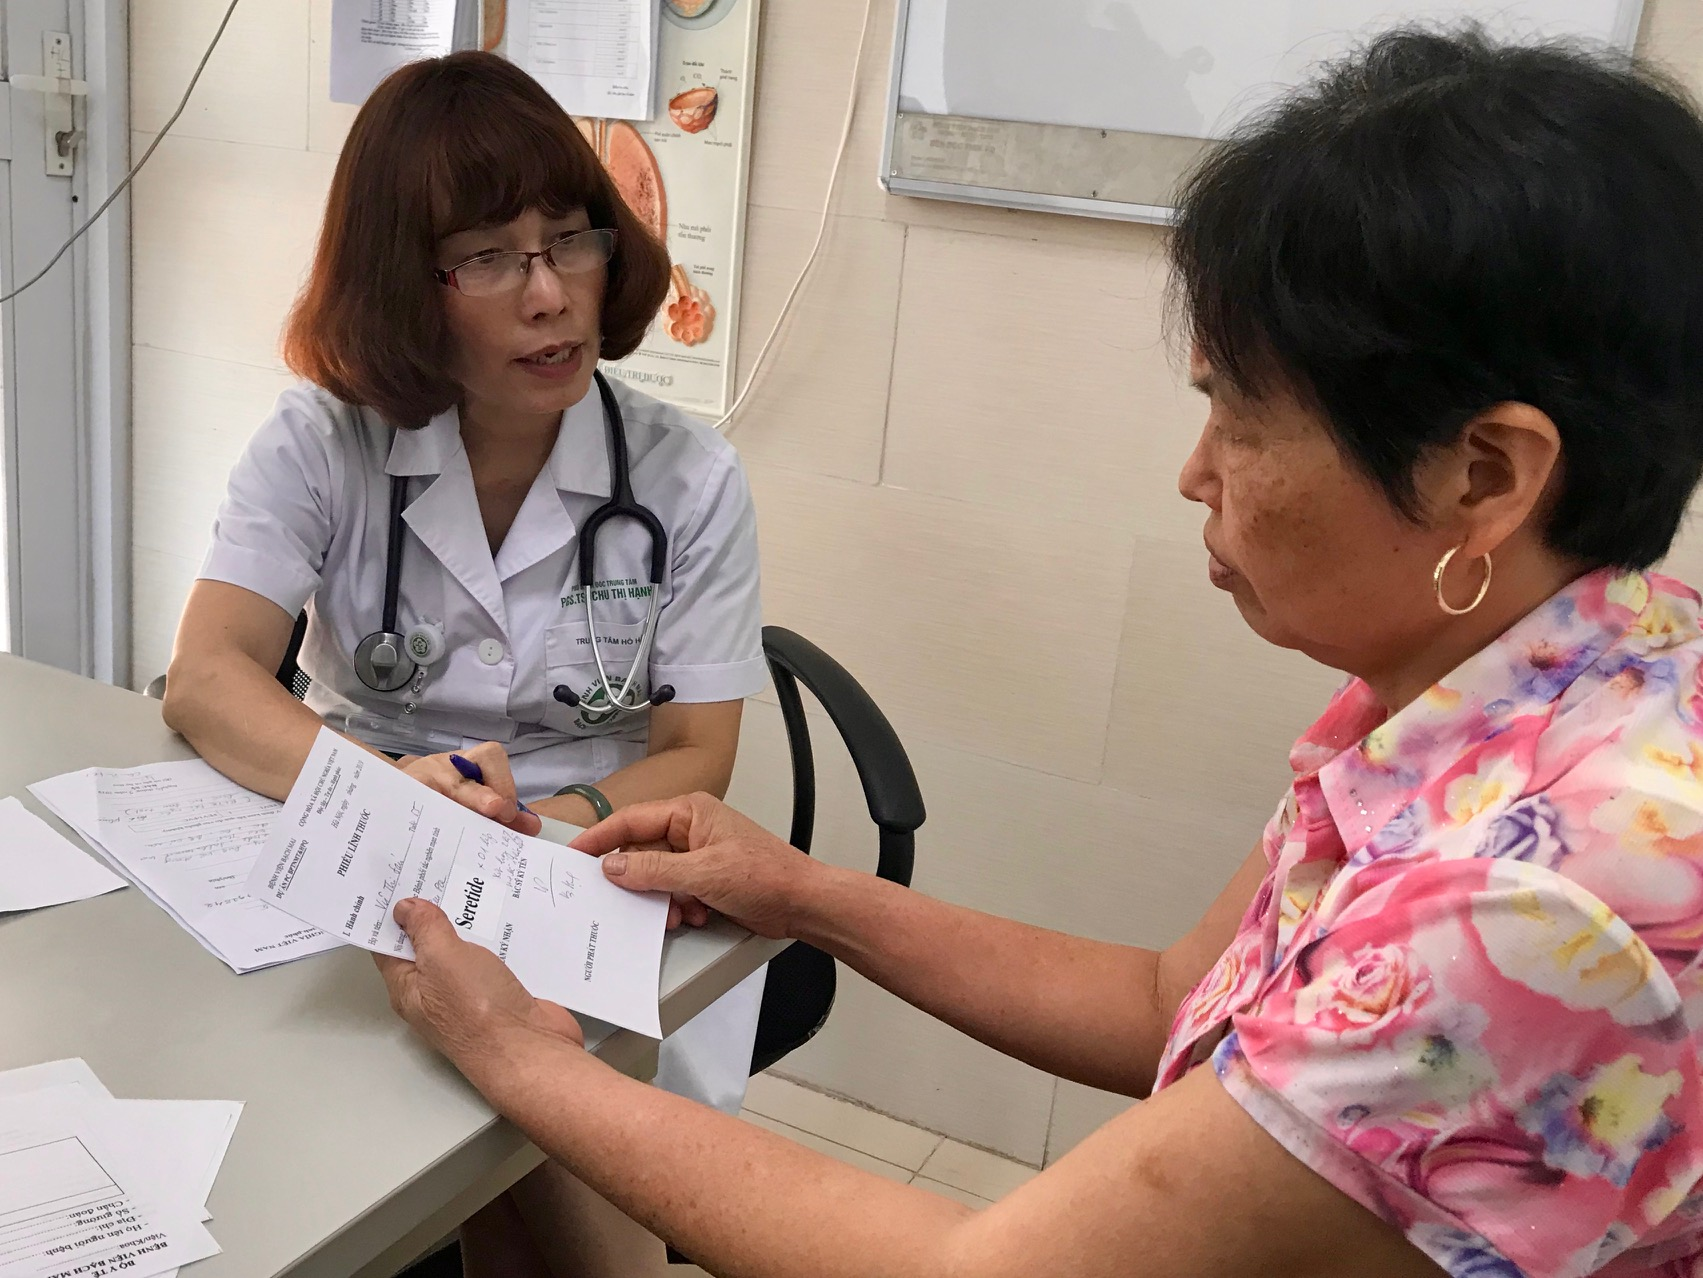 PGS Hạnh tham kham cho BN BPTNMT